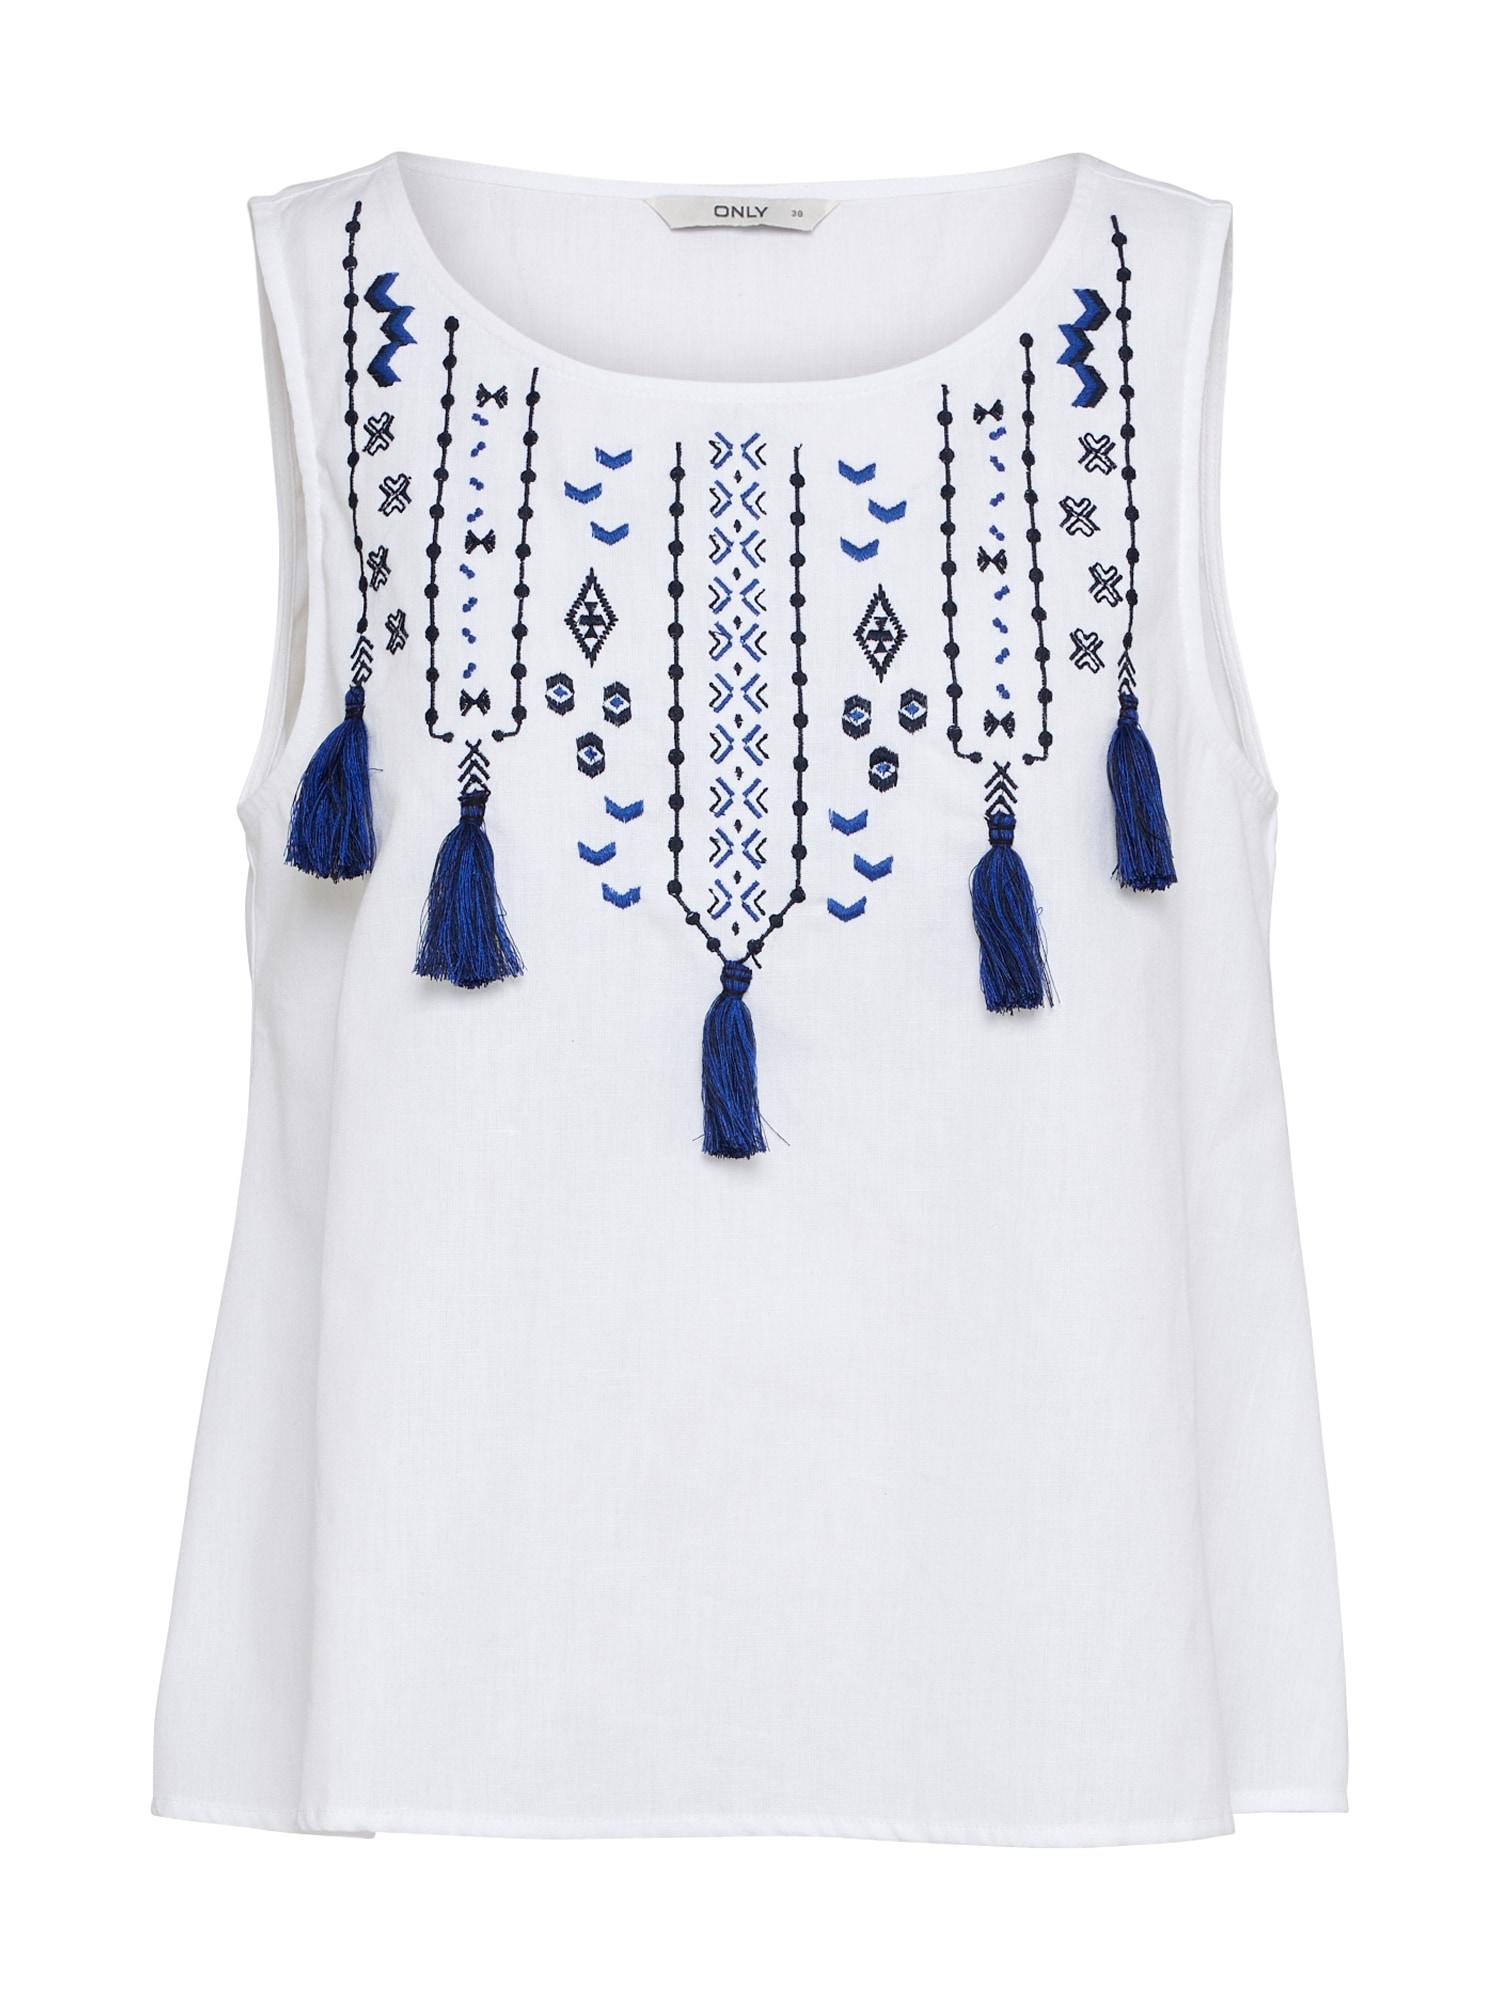 Top SALLY modrá bílá ONLY